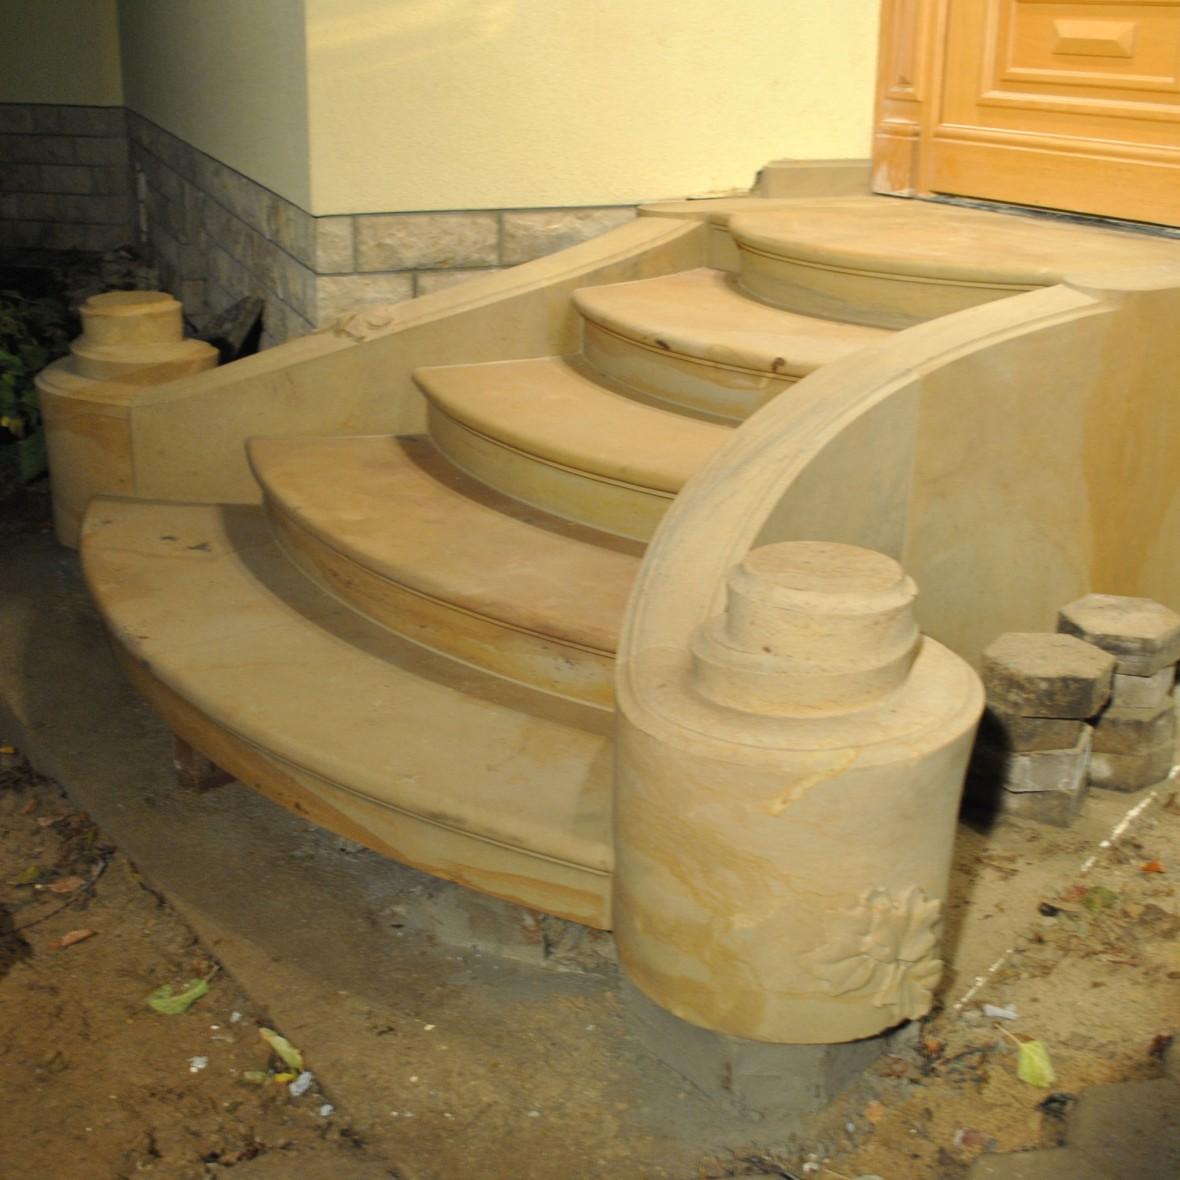 Treppen geschwungen mit Volute - 2